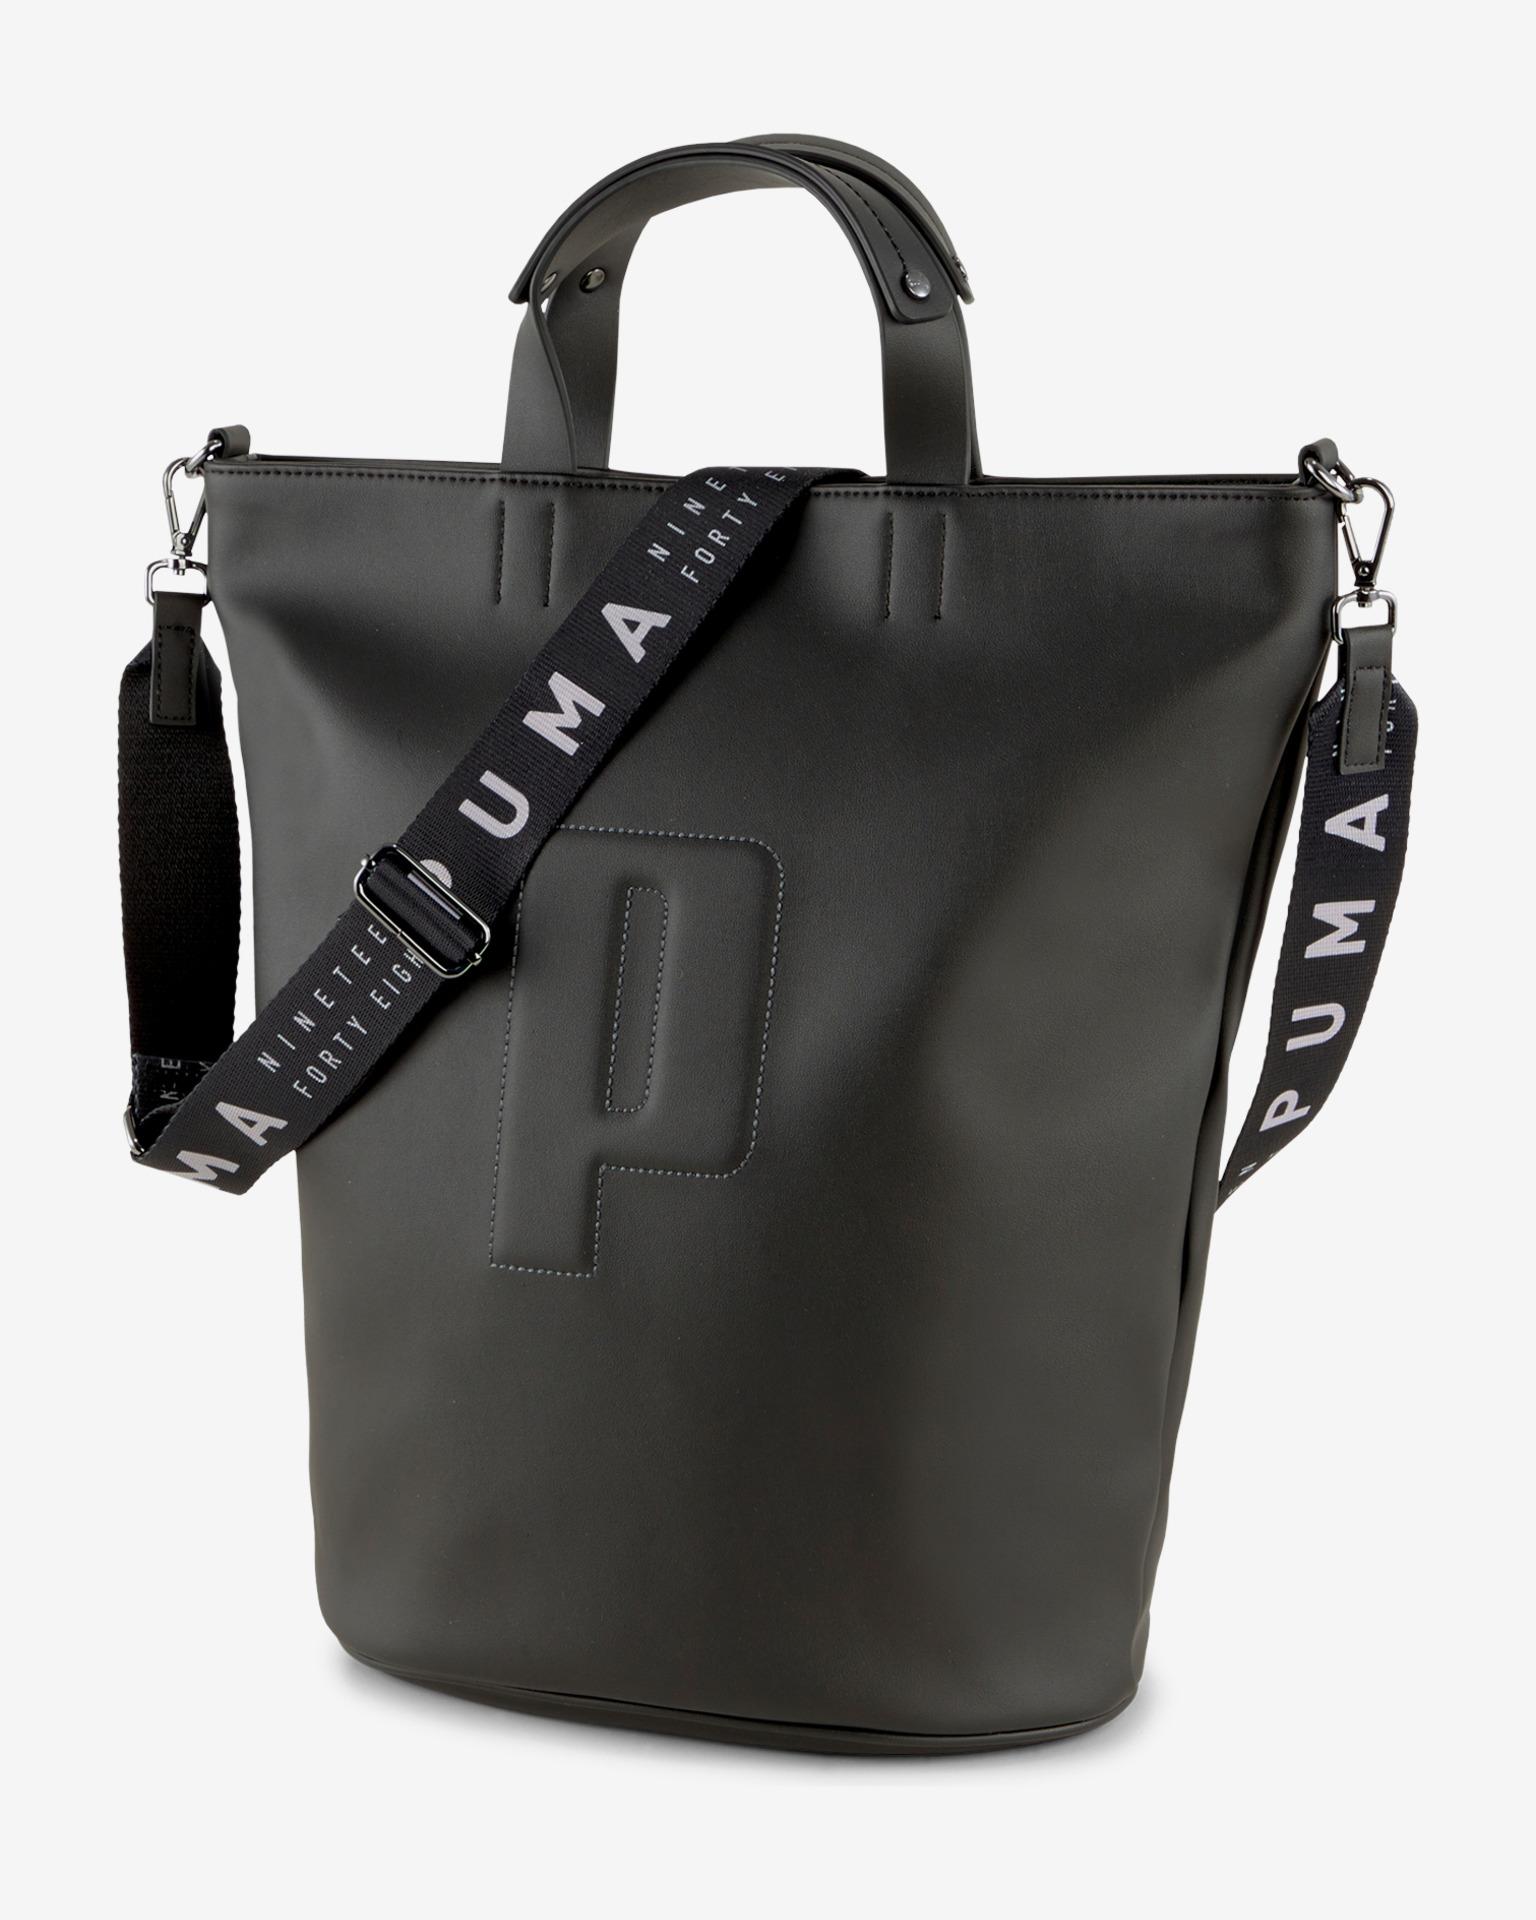 Puma Ženske torbice črna Kabelka